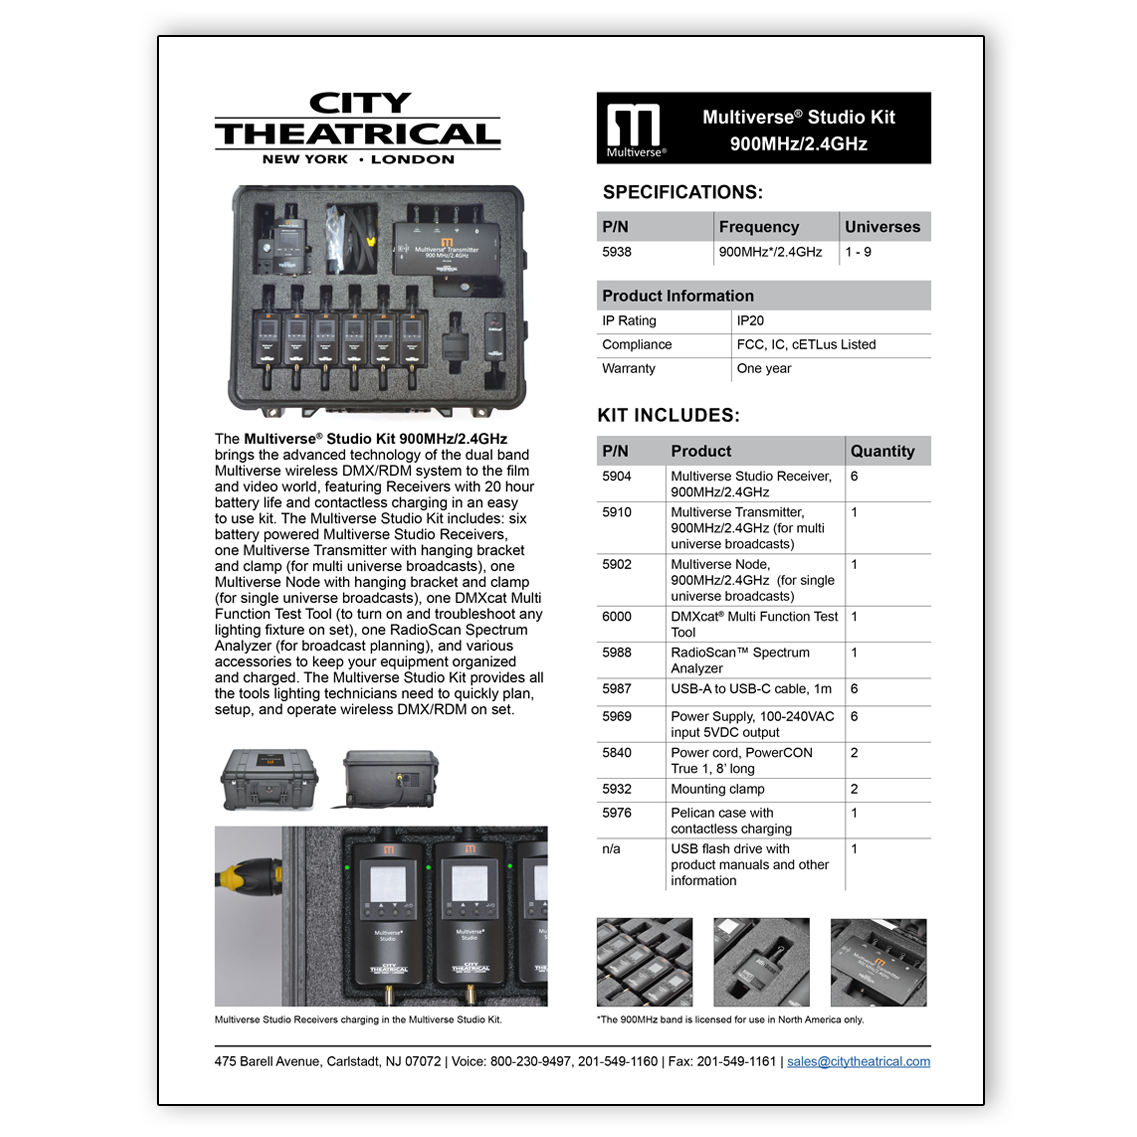 5938 Multiverse Studio Kit cut sheet